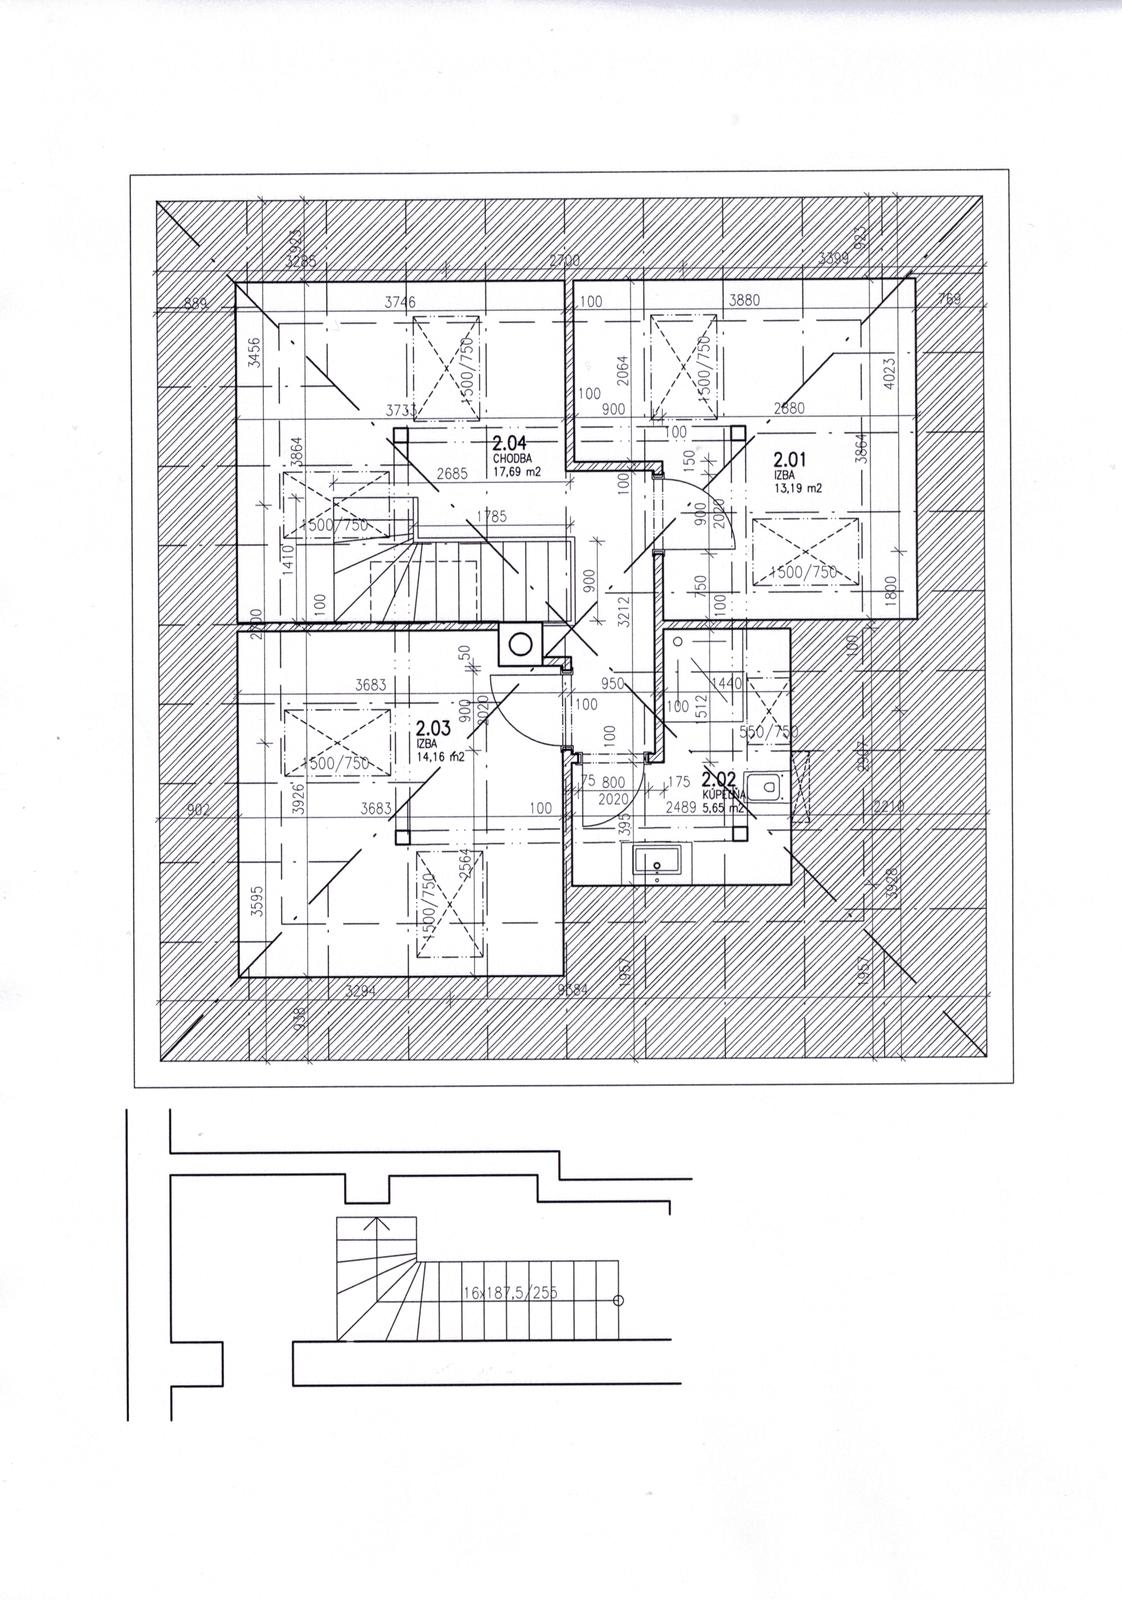 Dalsi level - zo stareho skoro nove - druhy navrh podkrovia - ale aj ten treba prerobit, architekt pozabudol, kde bude vytiahnuta stupacka